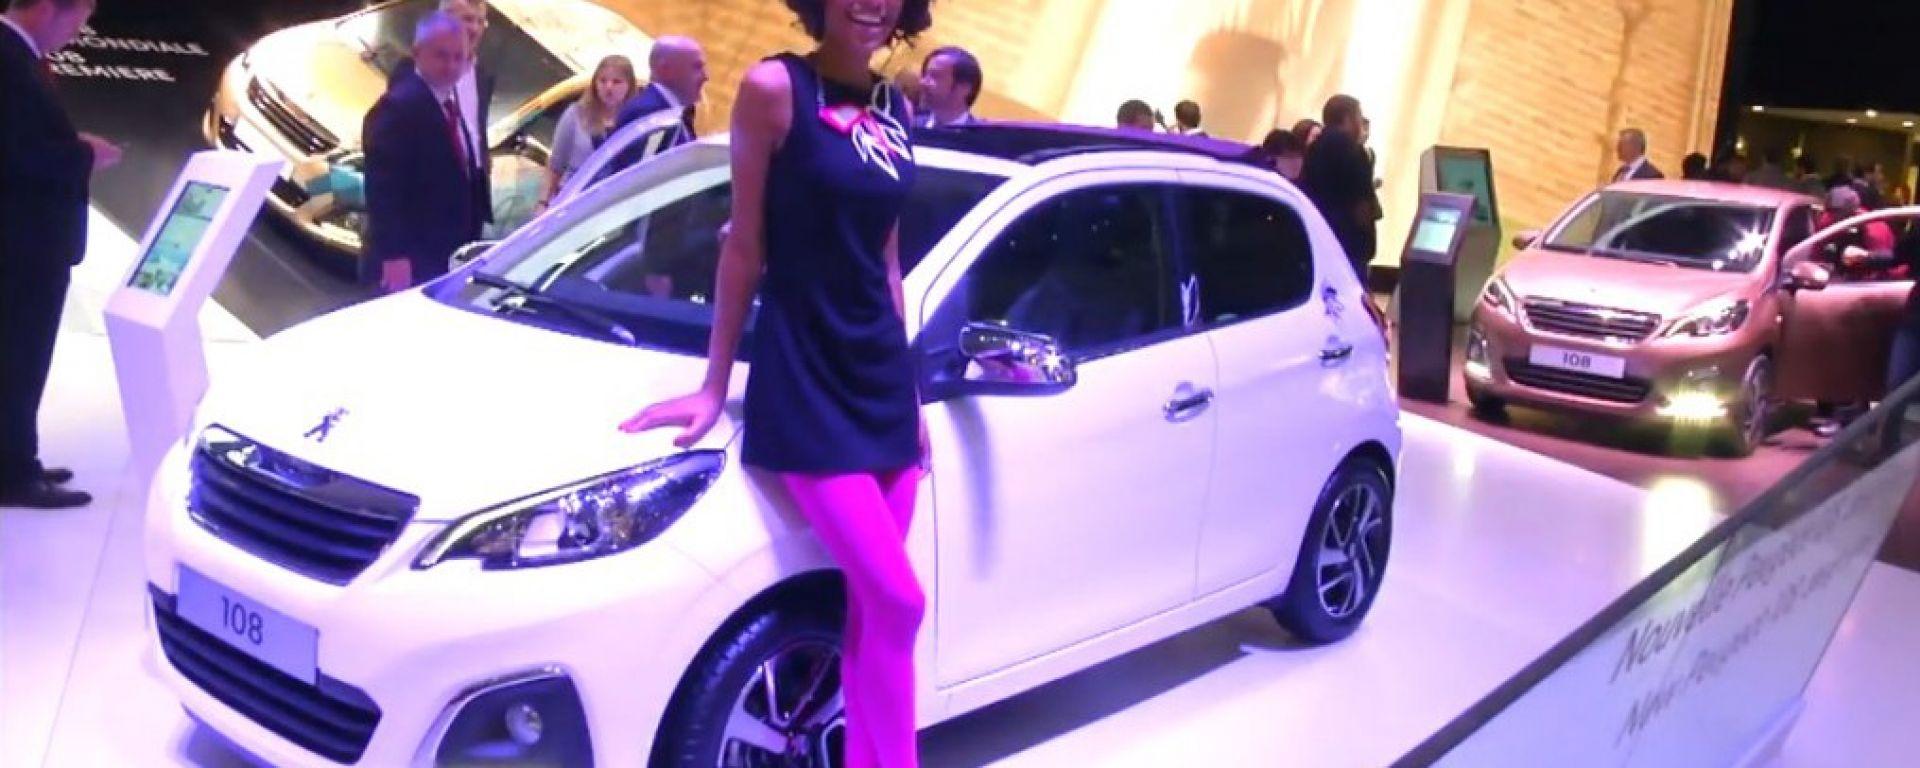 Salone di Ginevra 2014, lo stand Peugeot